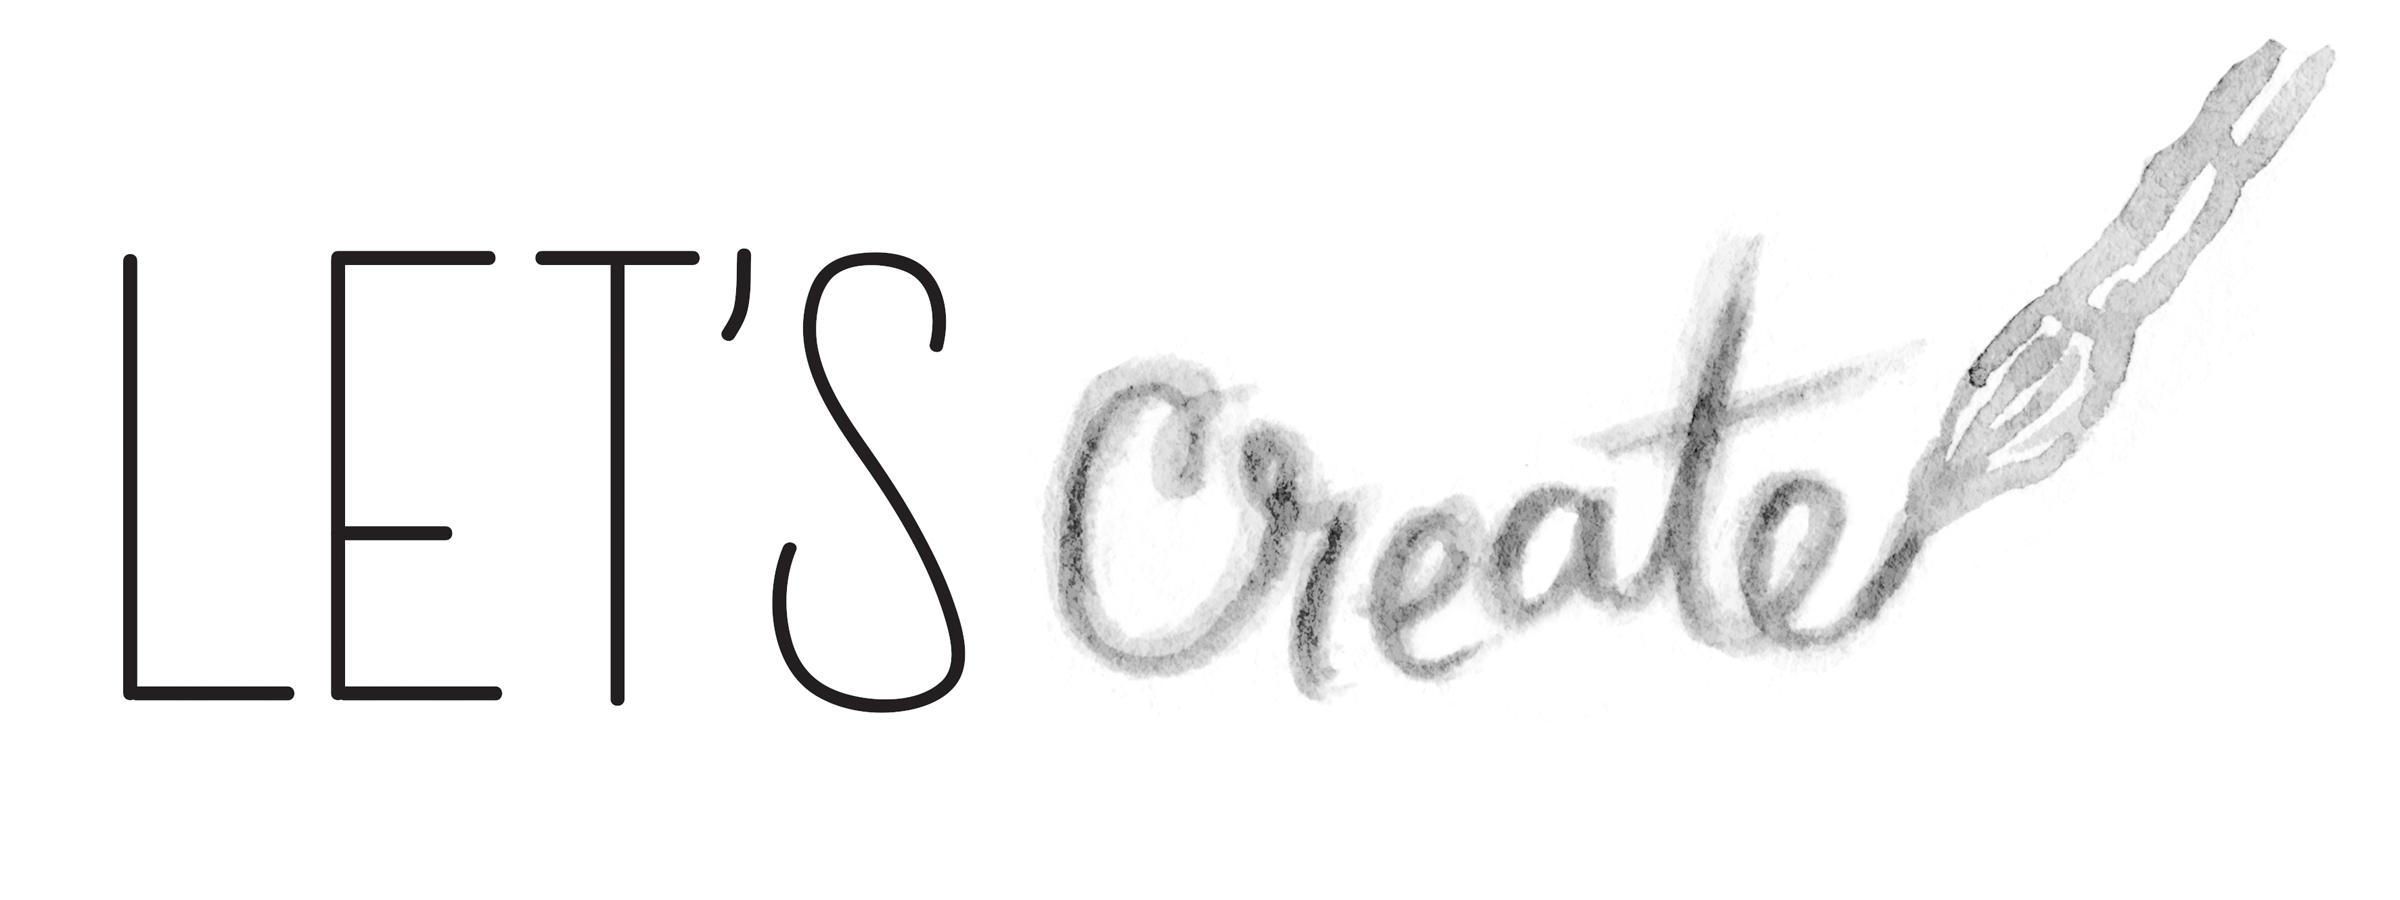 letscreate.jpg